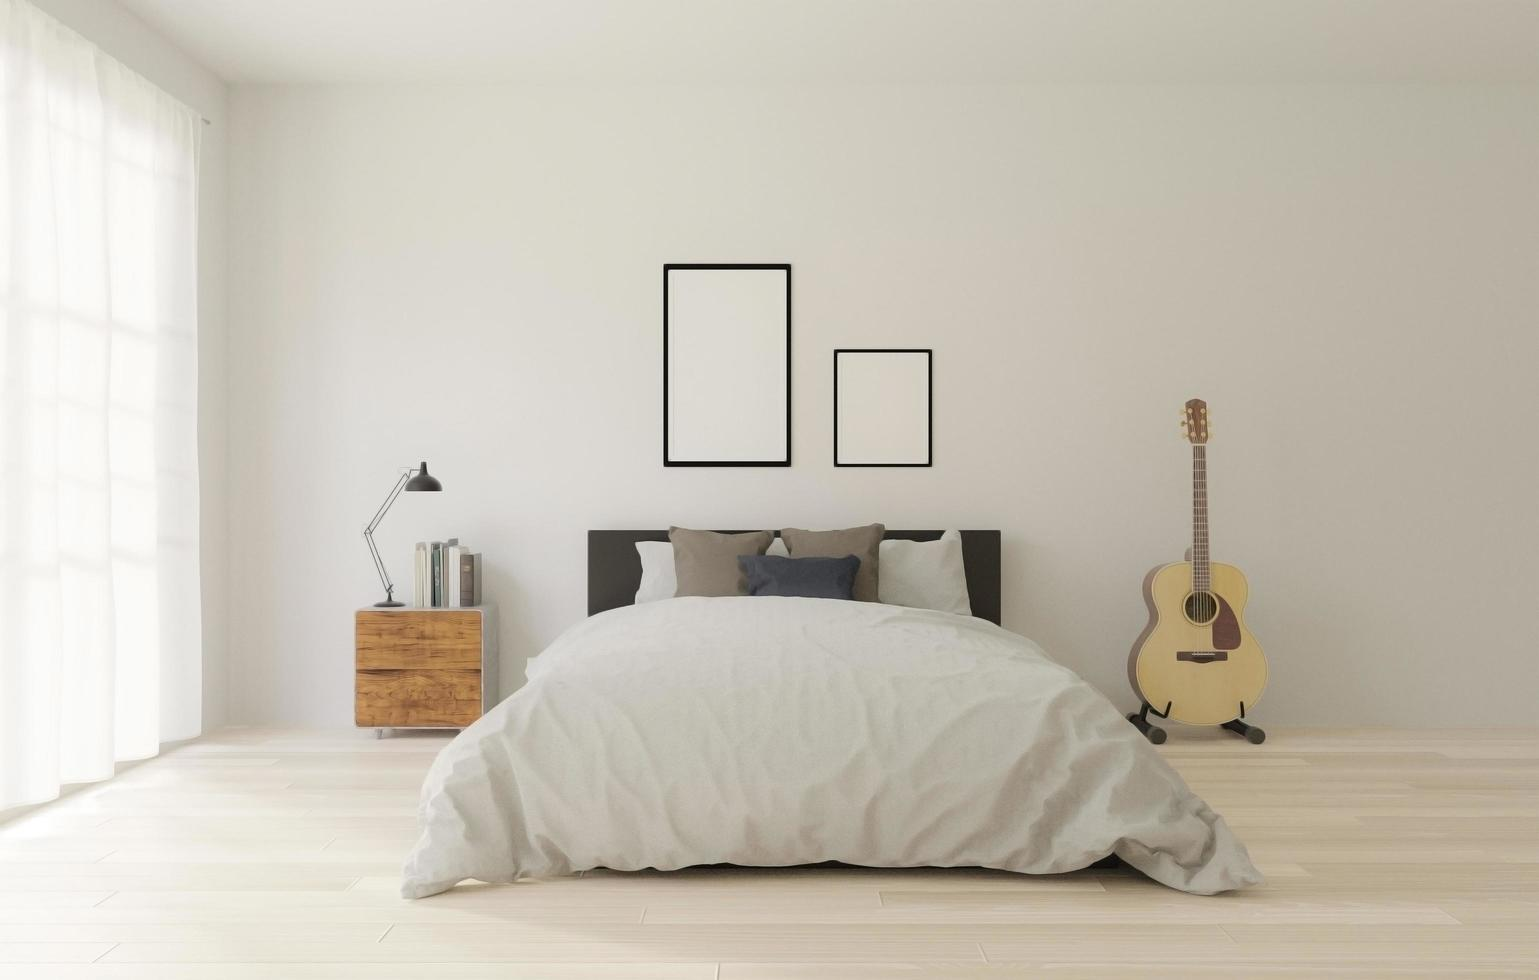 dormitorio tipo loft con pared blanca foto